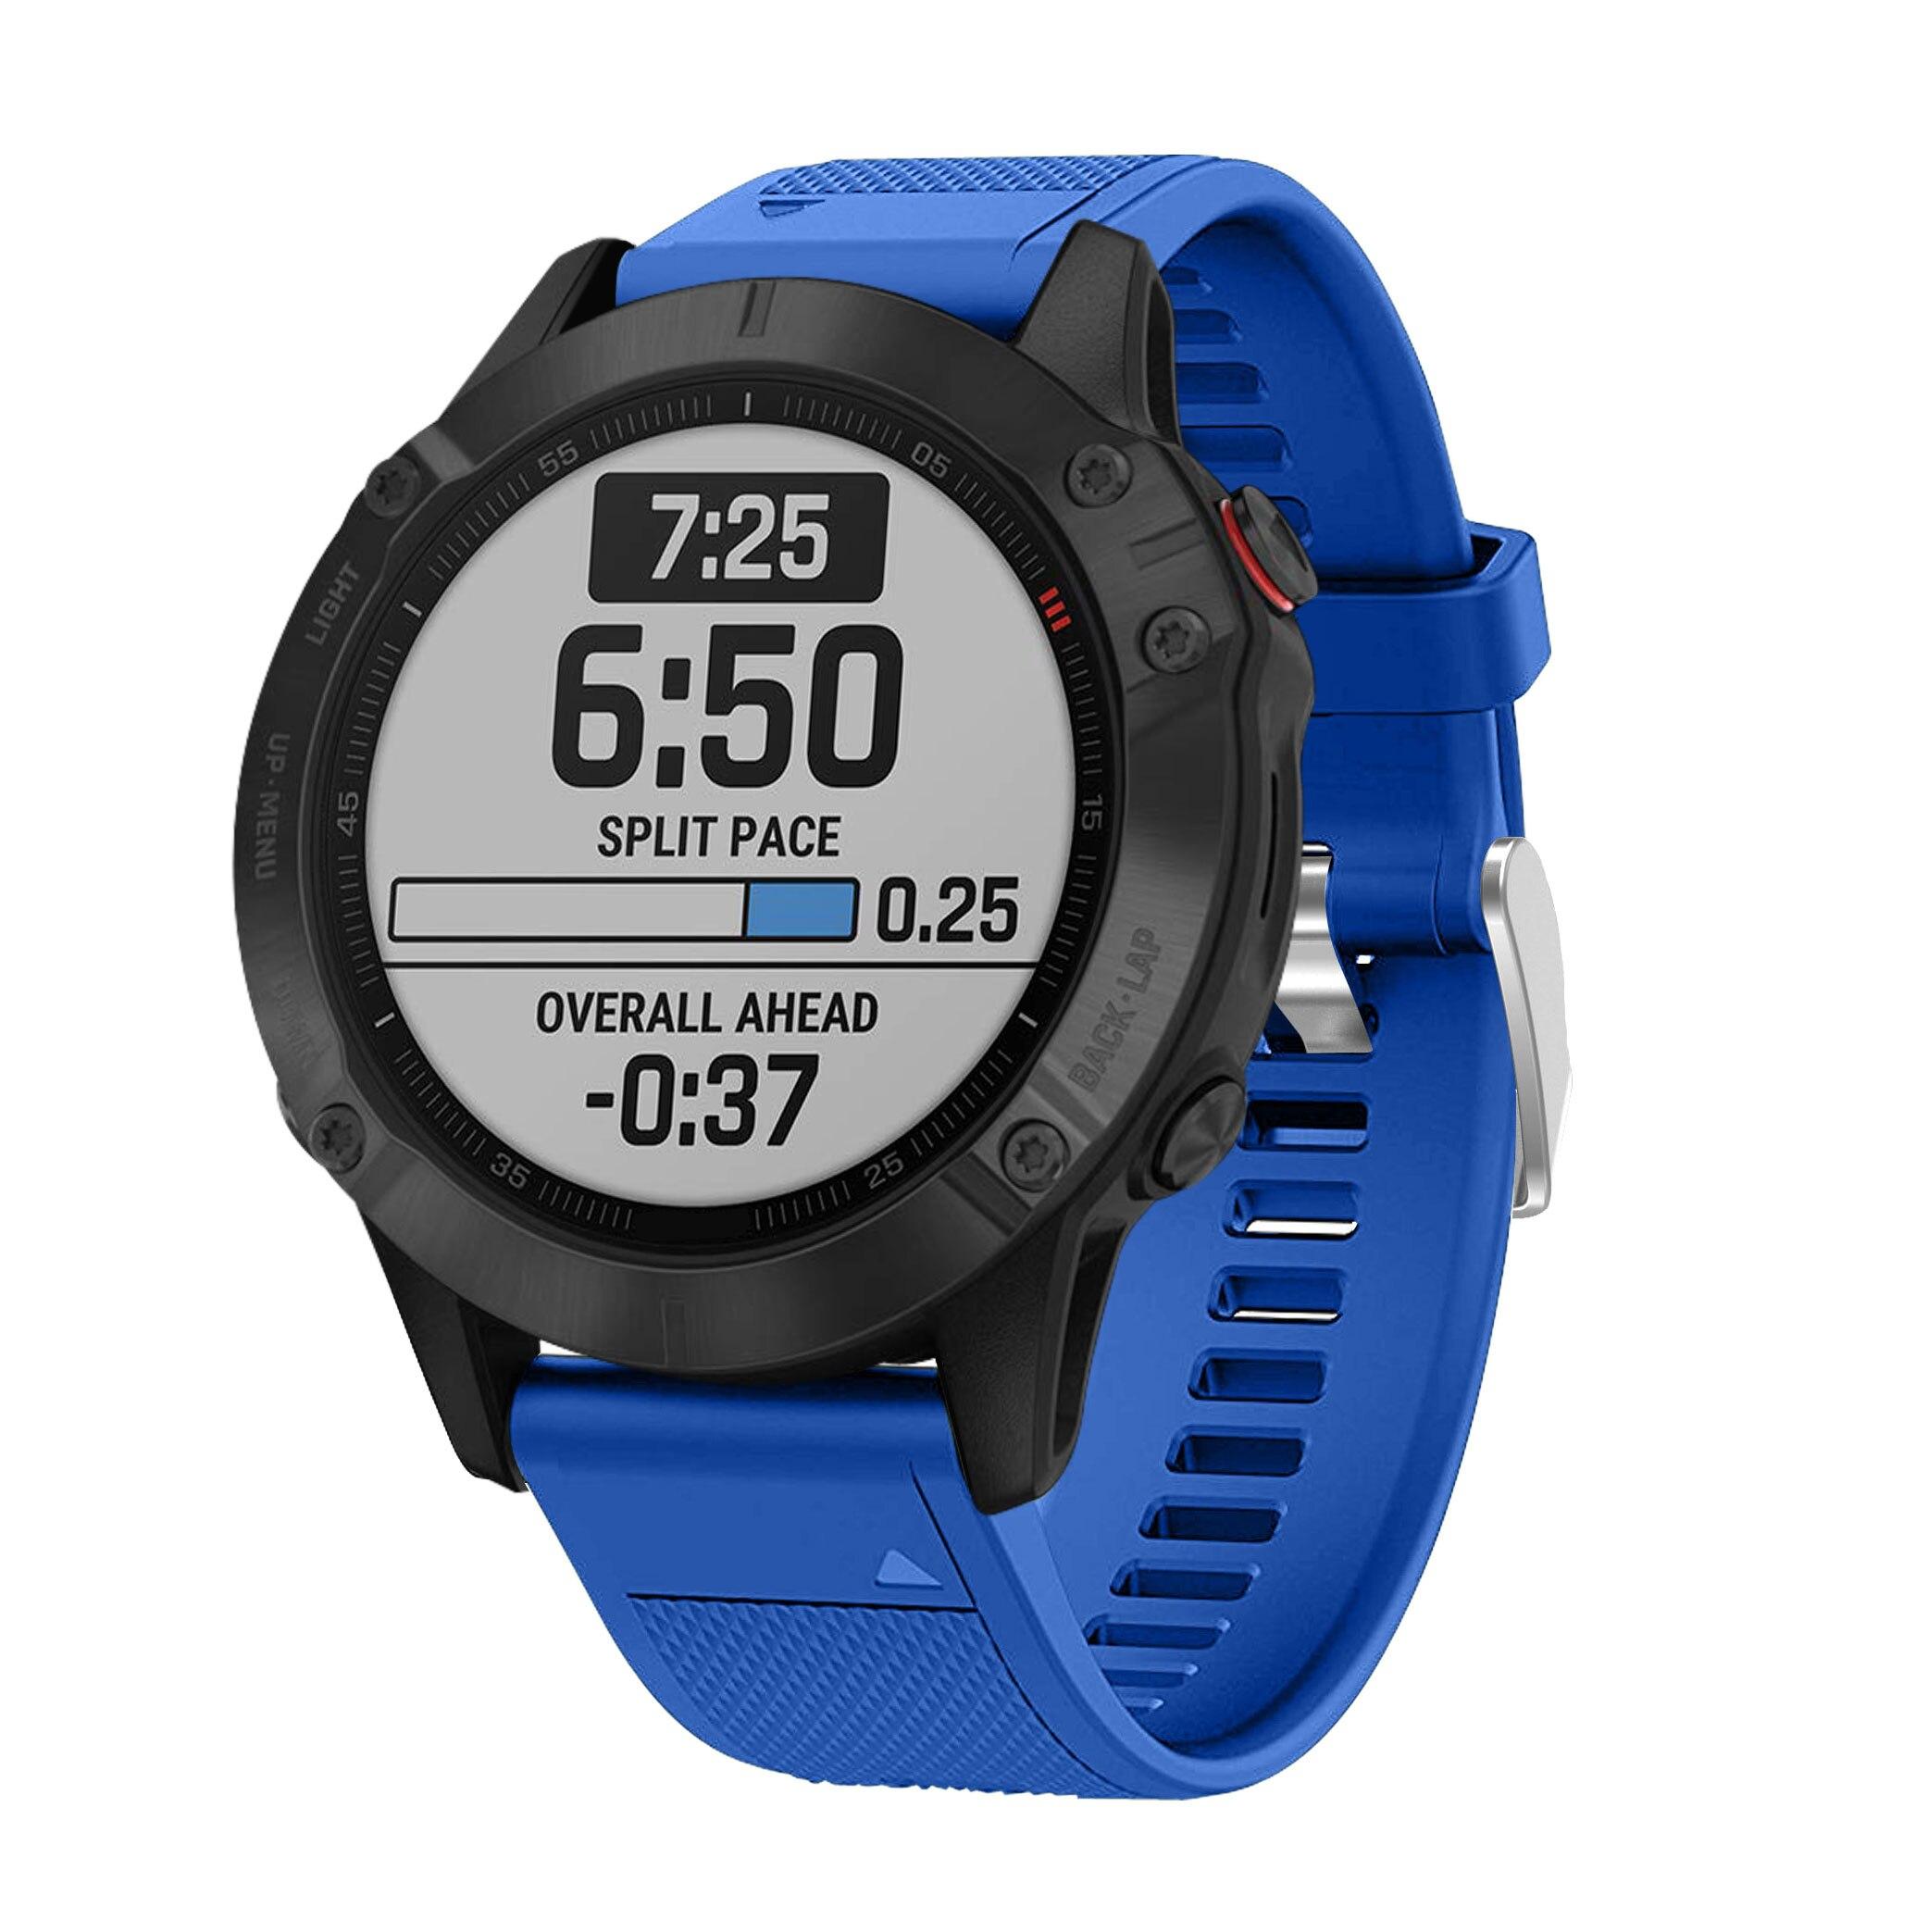 Watchband Strap bracelet for Garmin Fenix 6X 6 6S 3 3HR 935 945 Quatix 5 Smart Quick Release Silicone Easyfit WristBand Strap